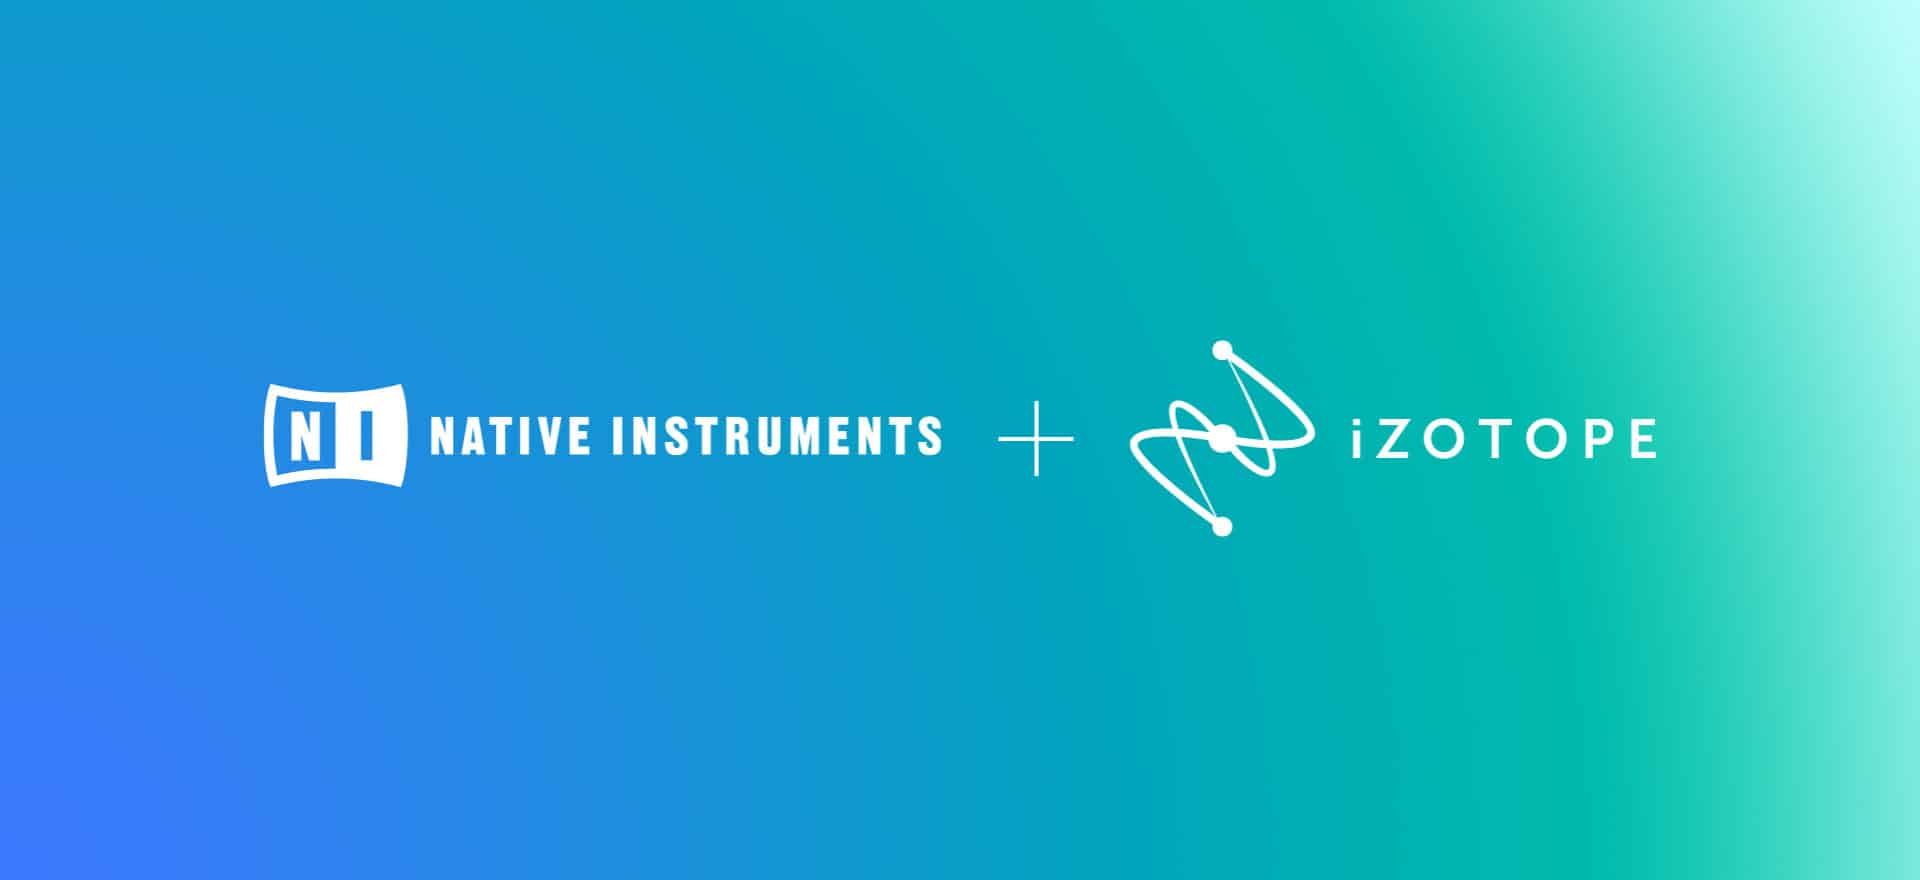 native instruments izotope